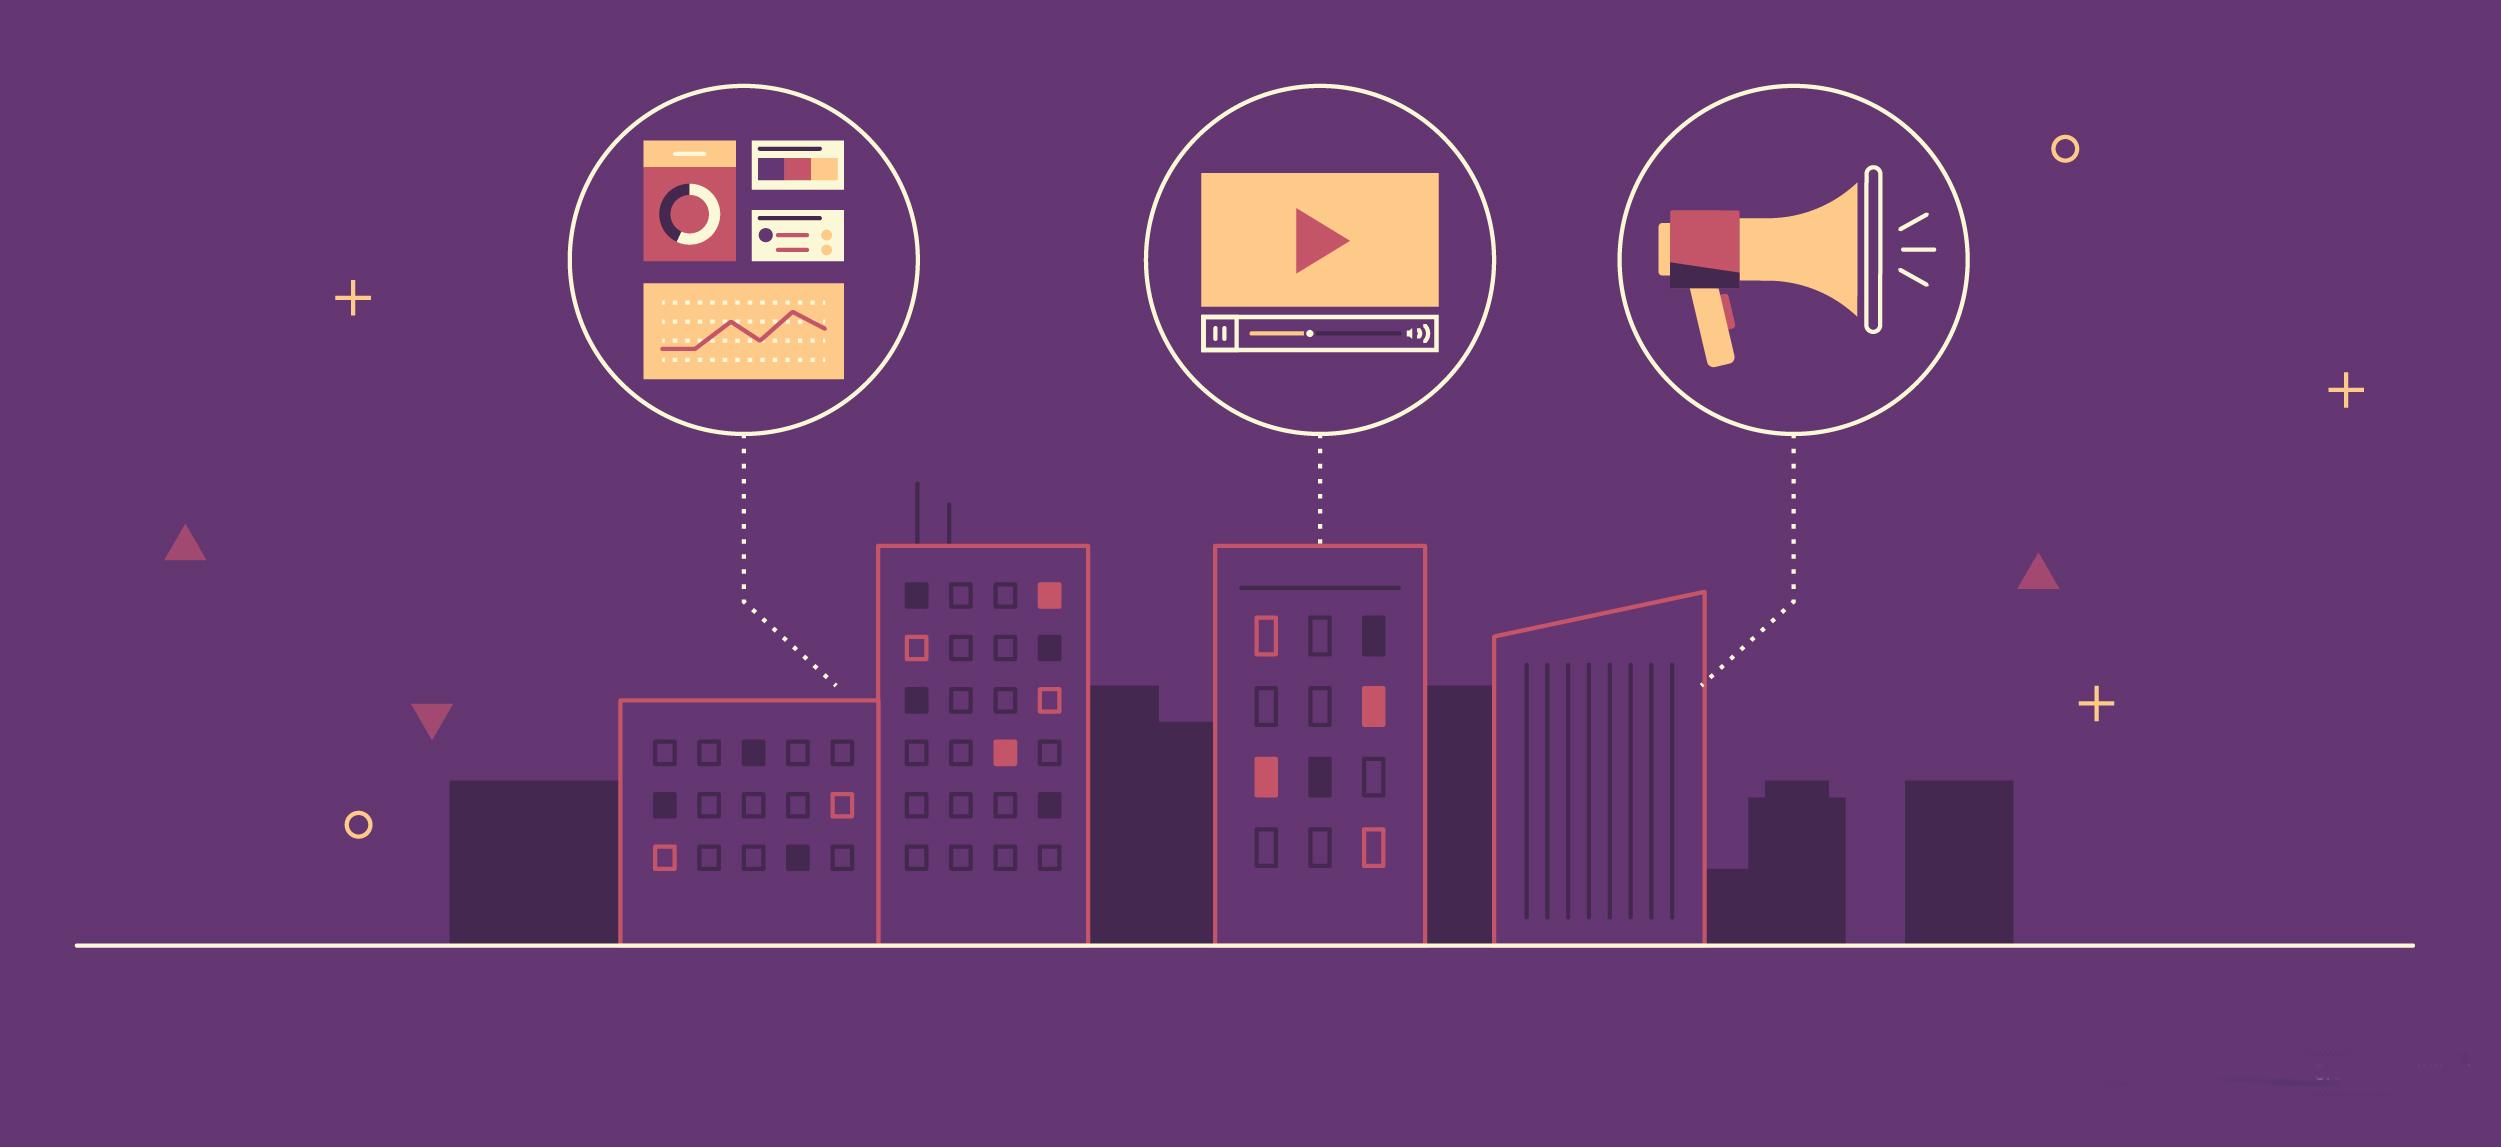 Illustration of a brand's visual communication strategy